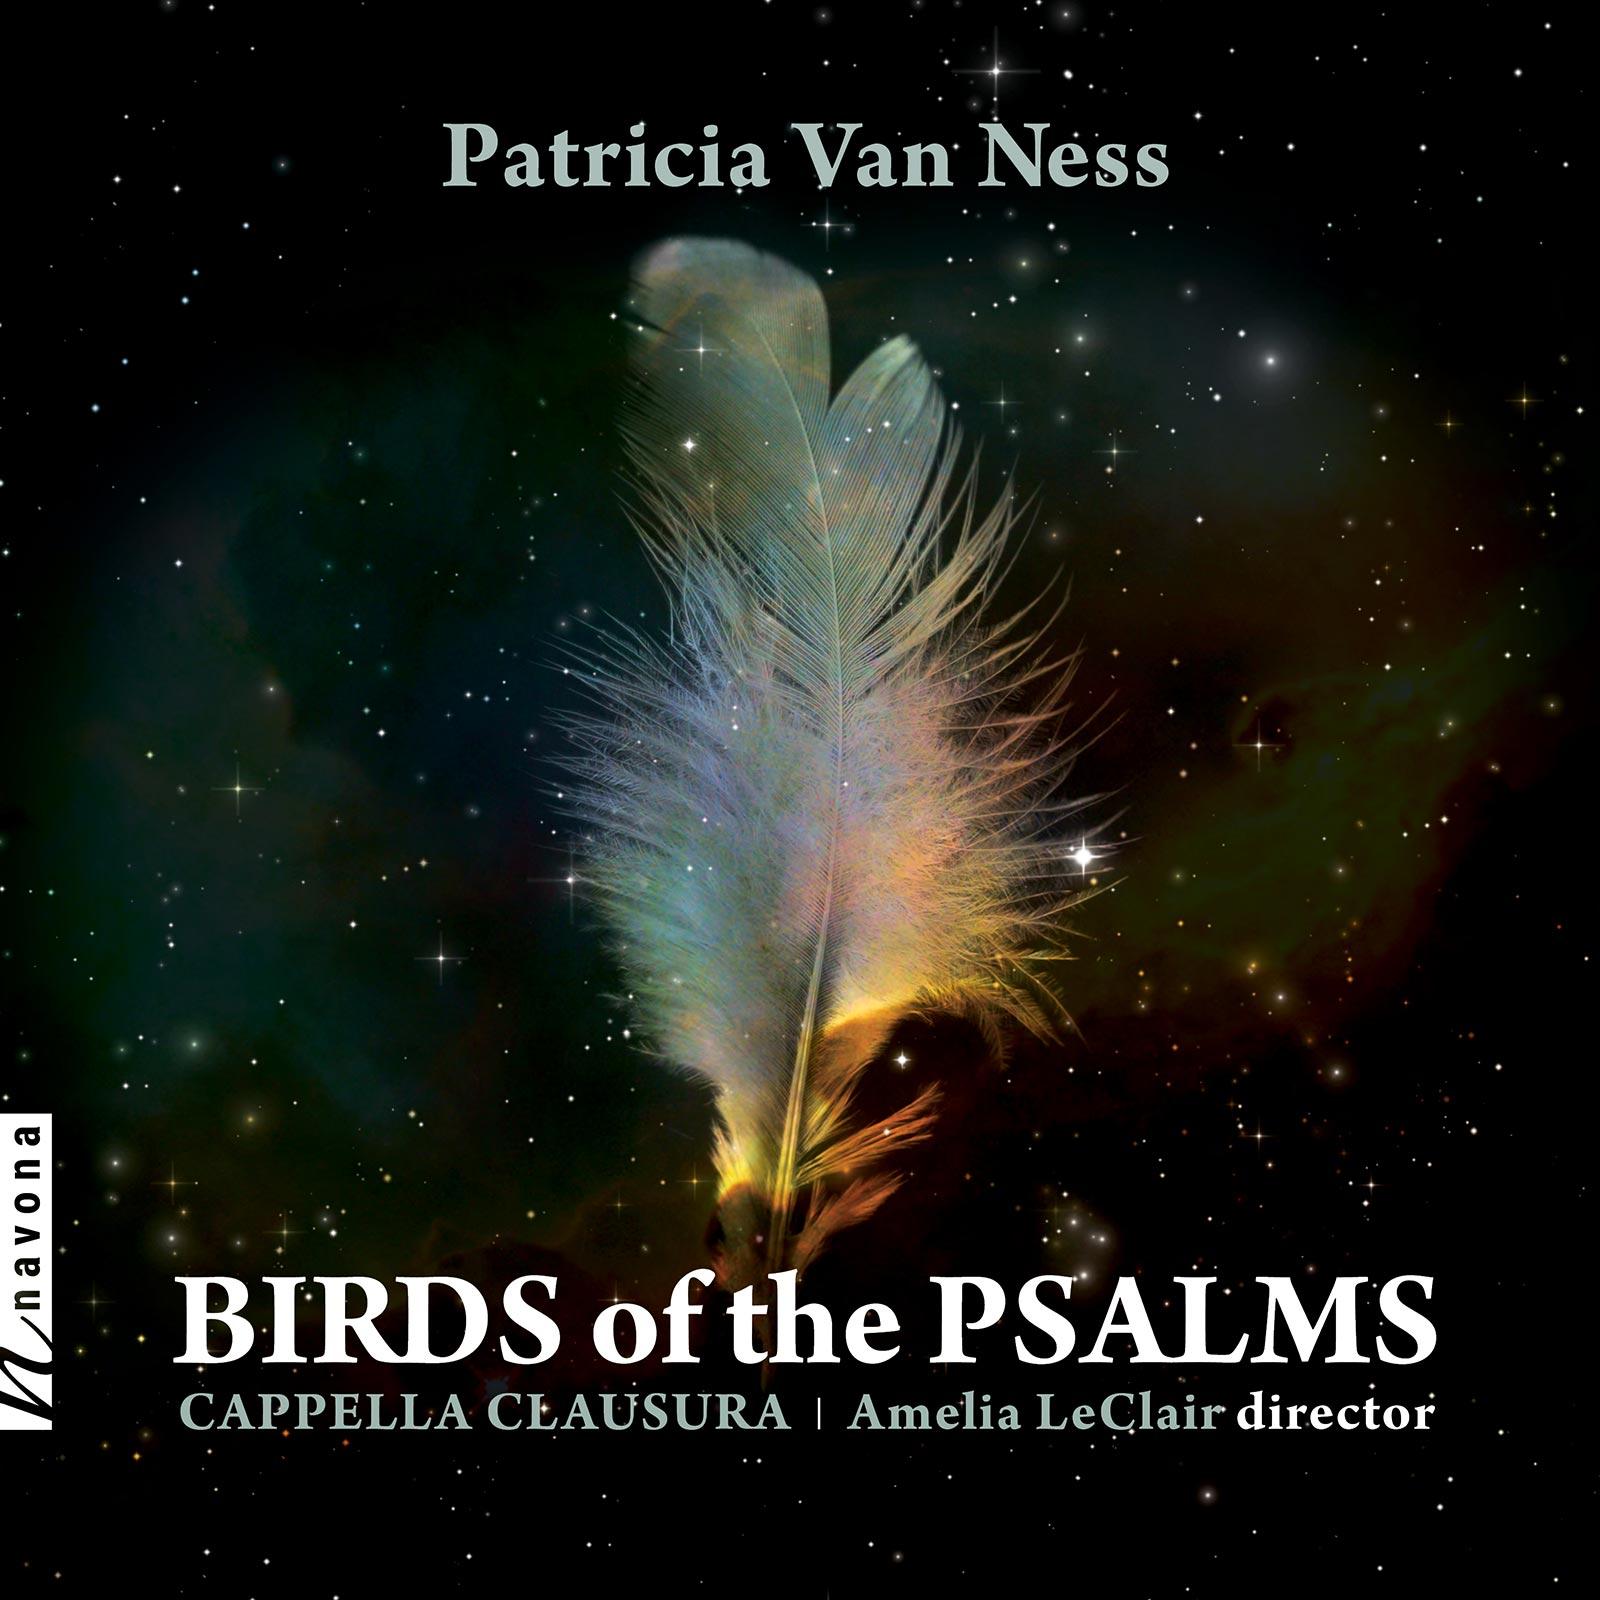 Birds of the Psalms